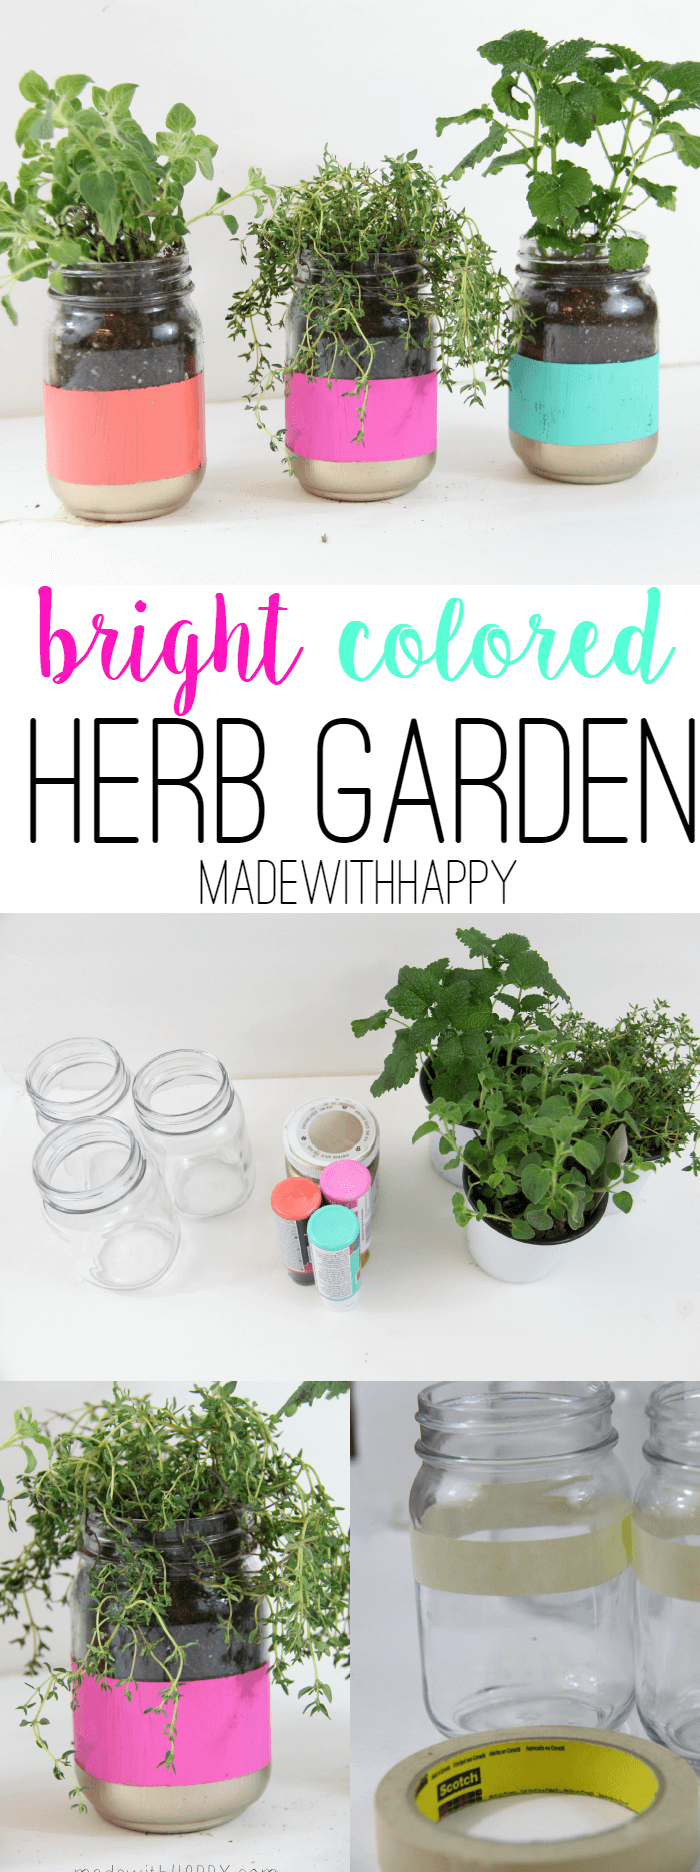 Bright Colored Herb Garden - Mason Jar Crafts - Easy Pop of Color - Spring Garden | Painted Mason Jar Garden | Modern Herb Garden - www.madewithHAPPY.com